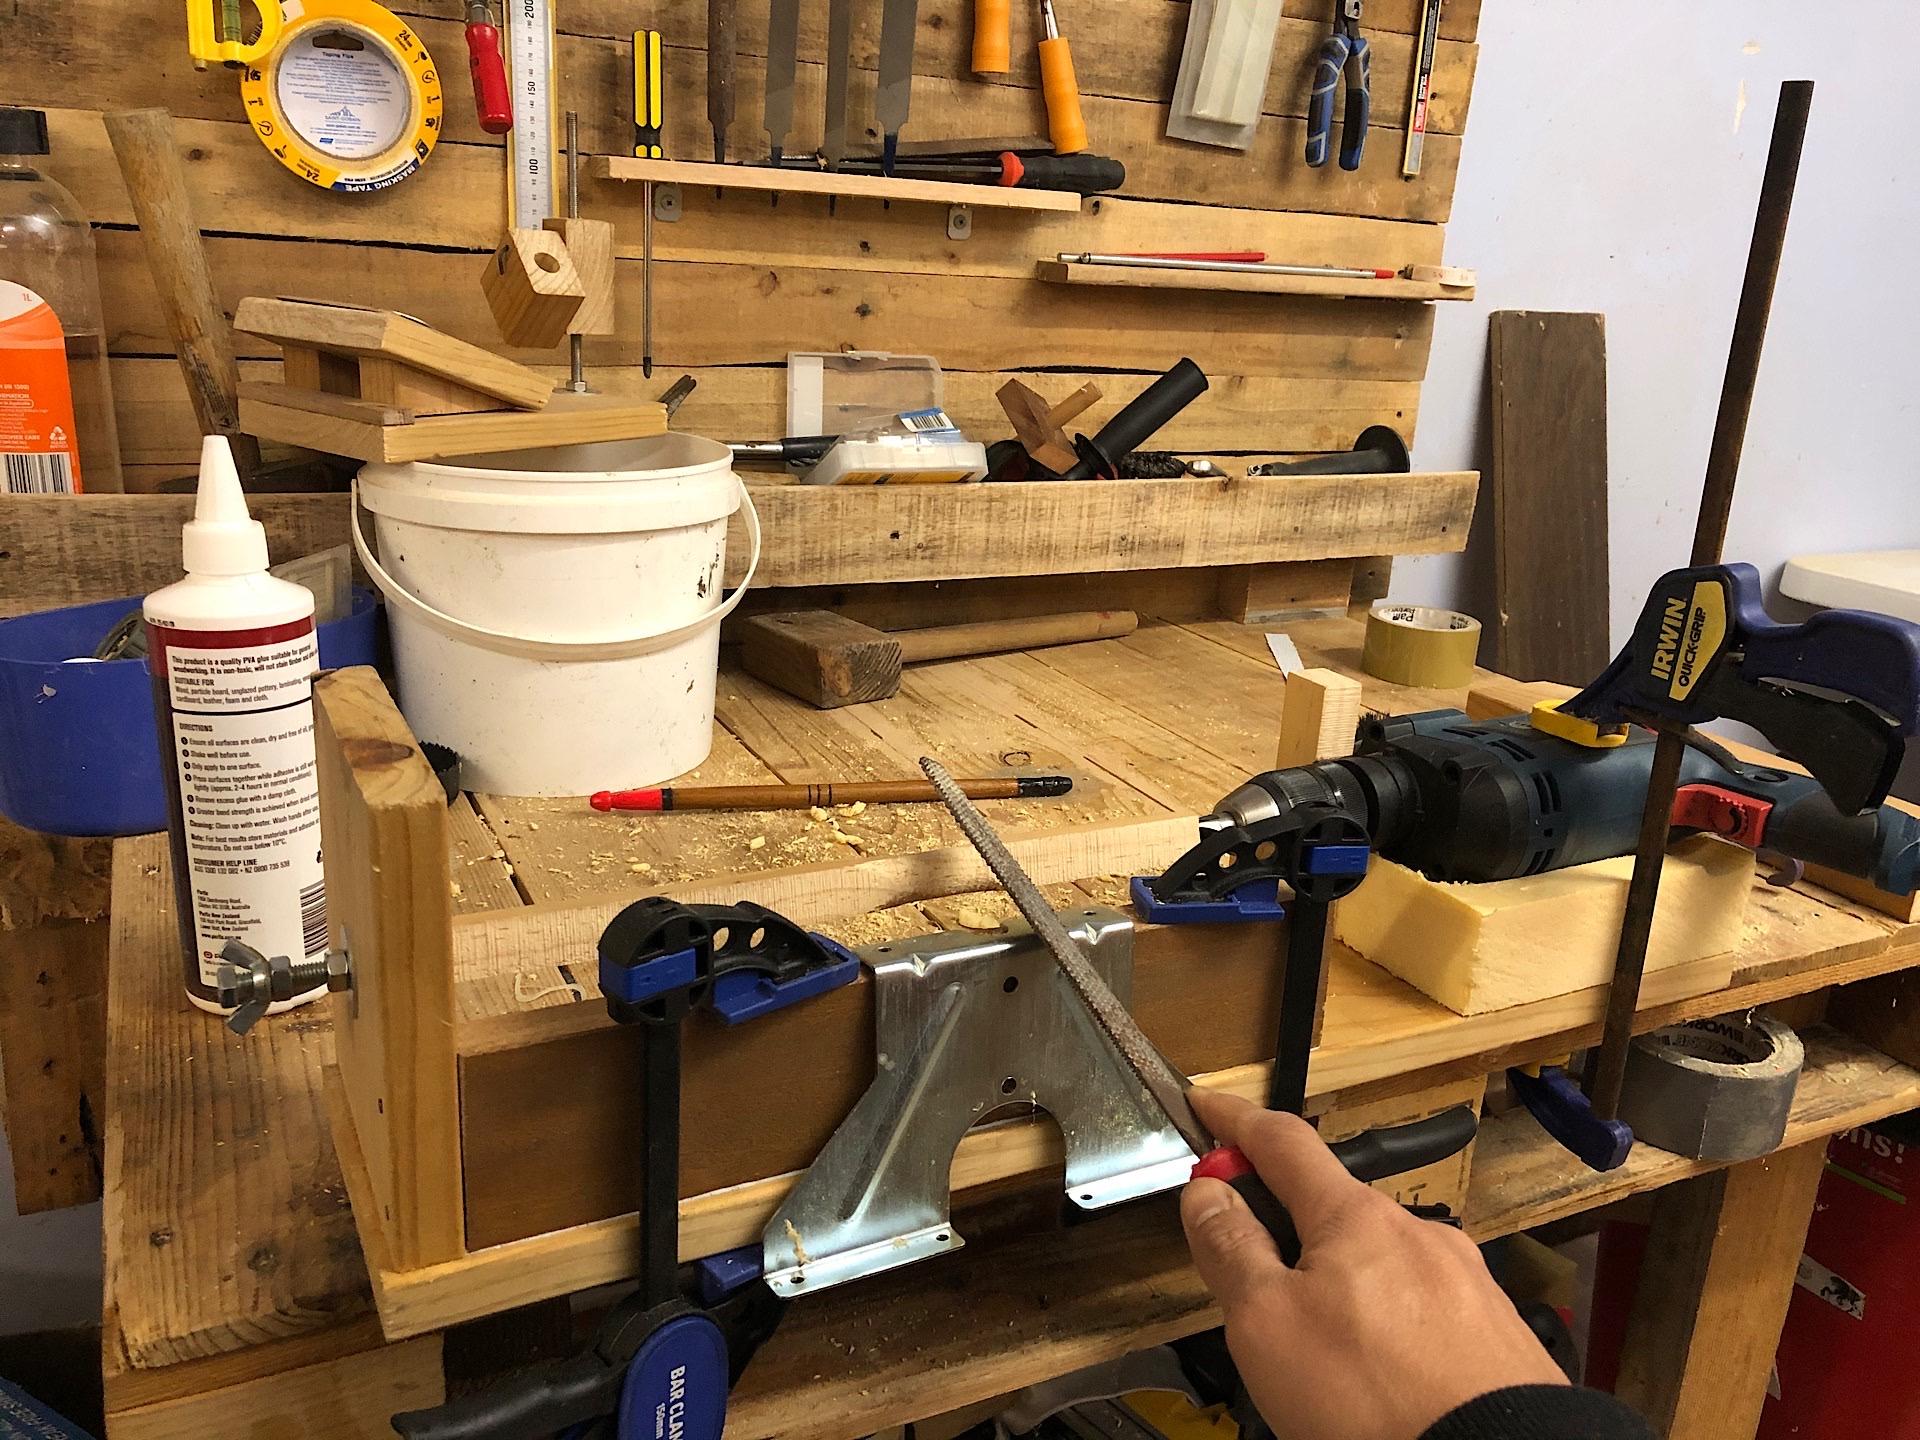 Homemade drill-powered lathe